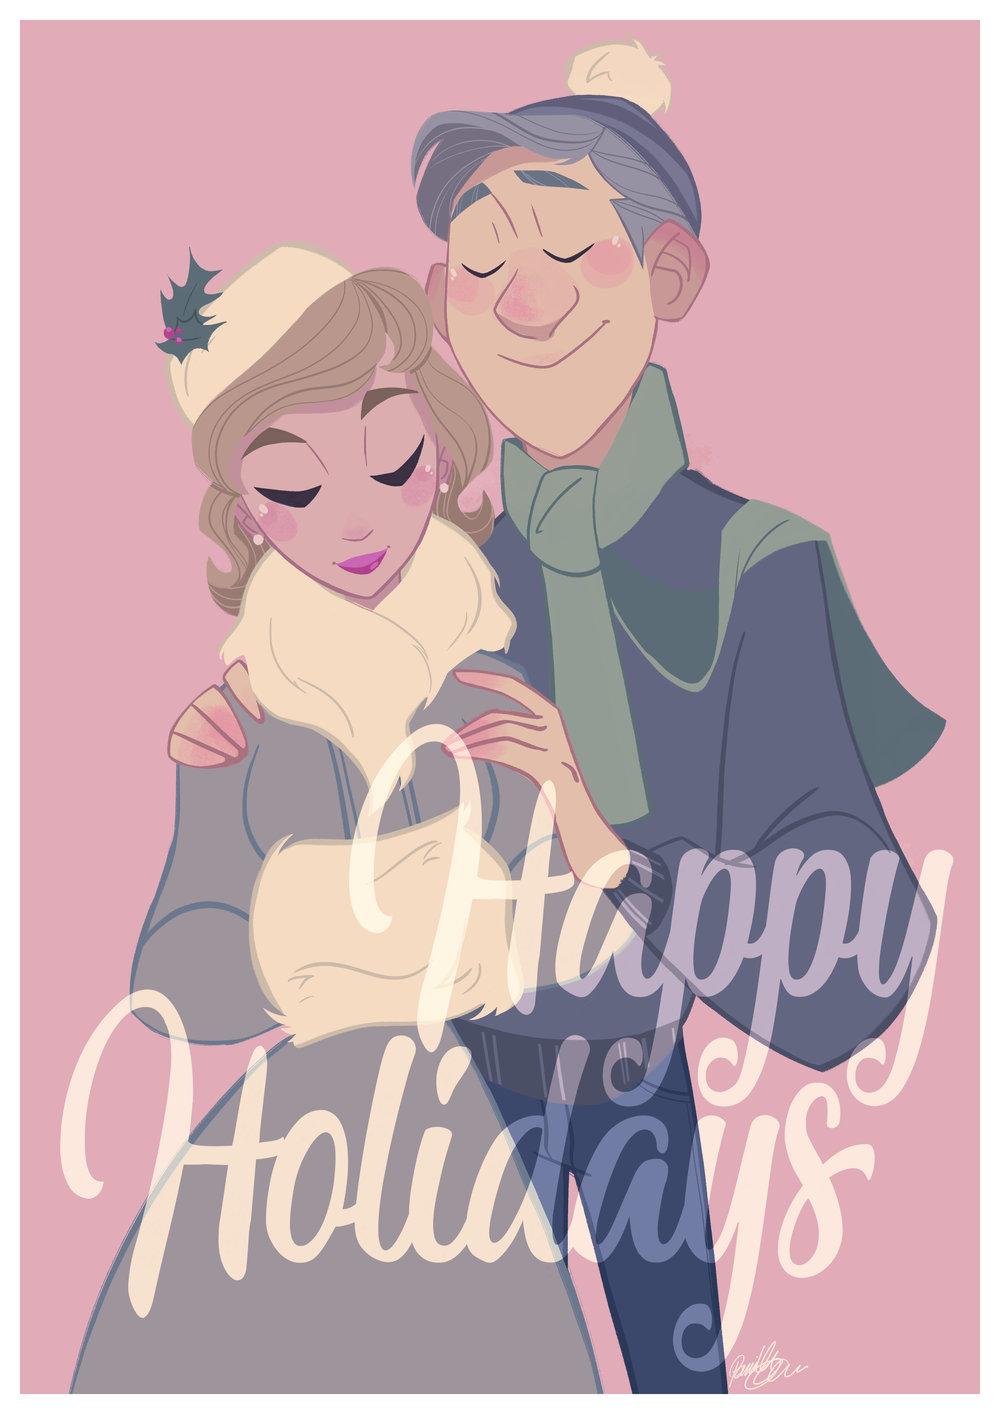 HolidayCards02.jpg